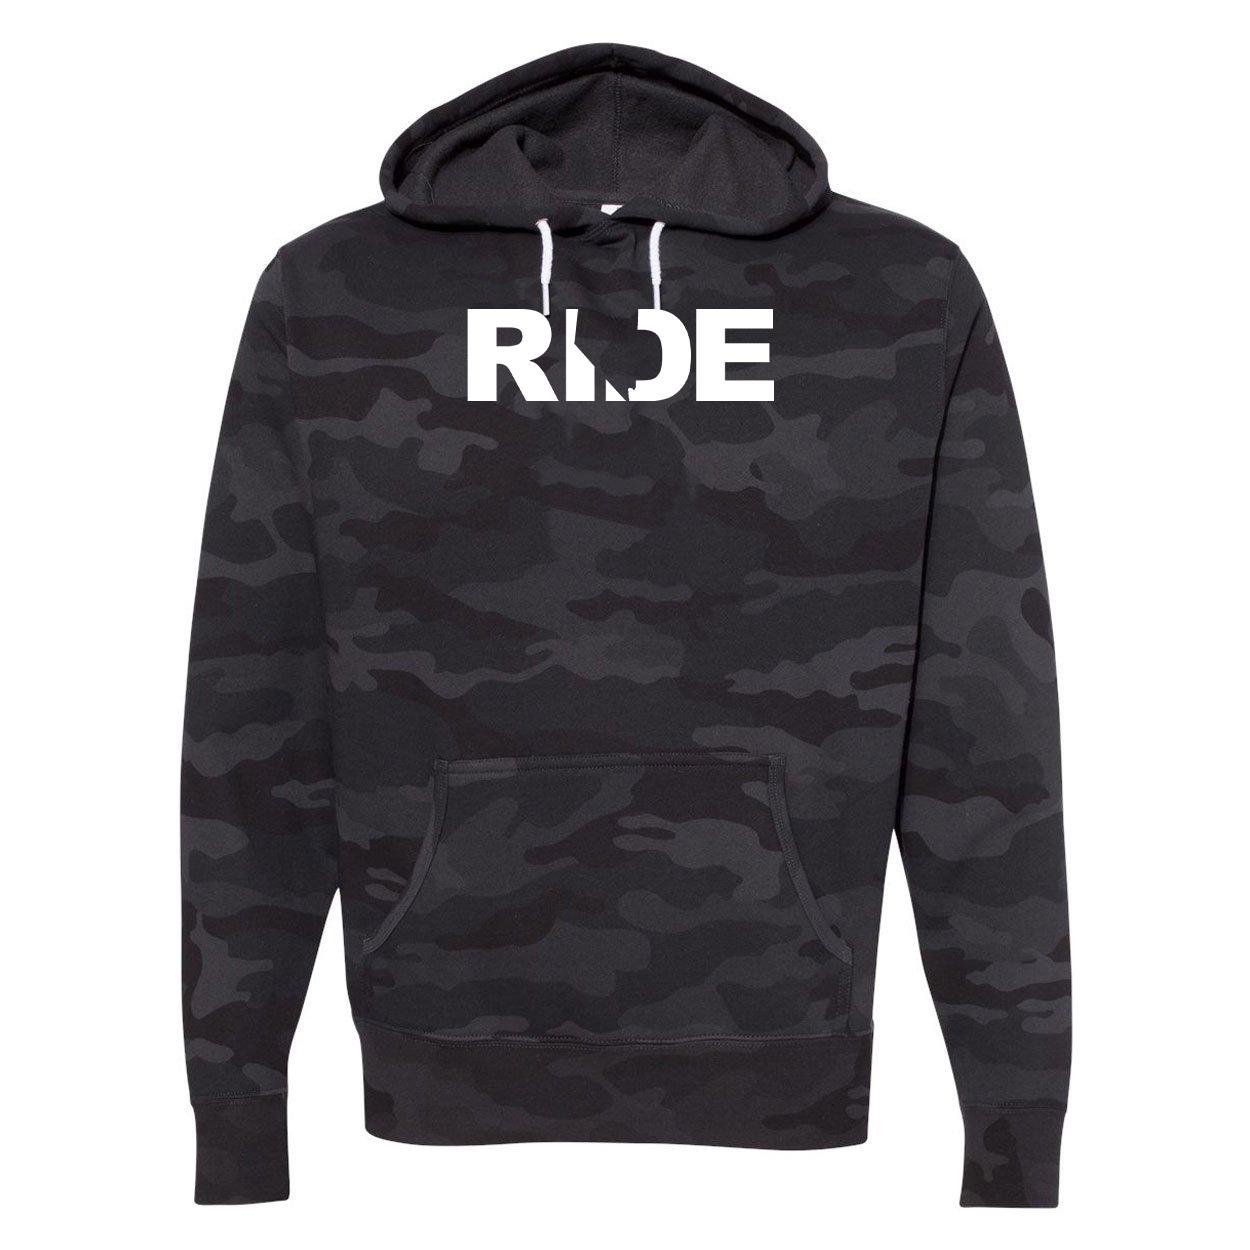 Ride Nevada Classic Unisex Hooded Sweatshirt Black Camo (White Logo)